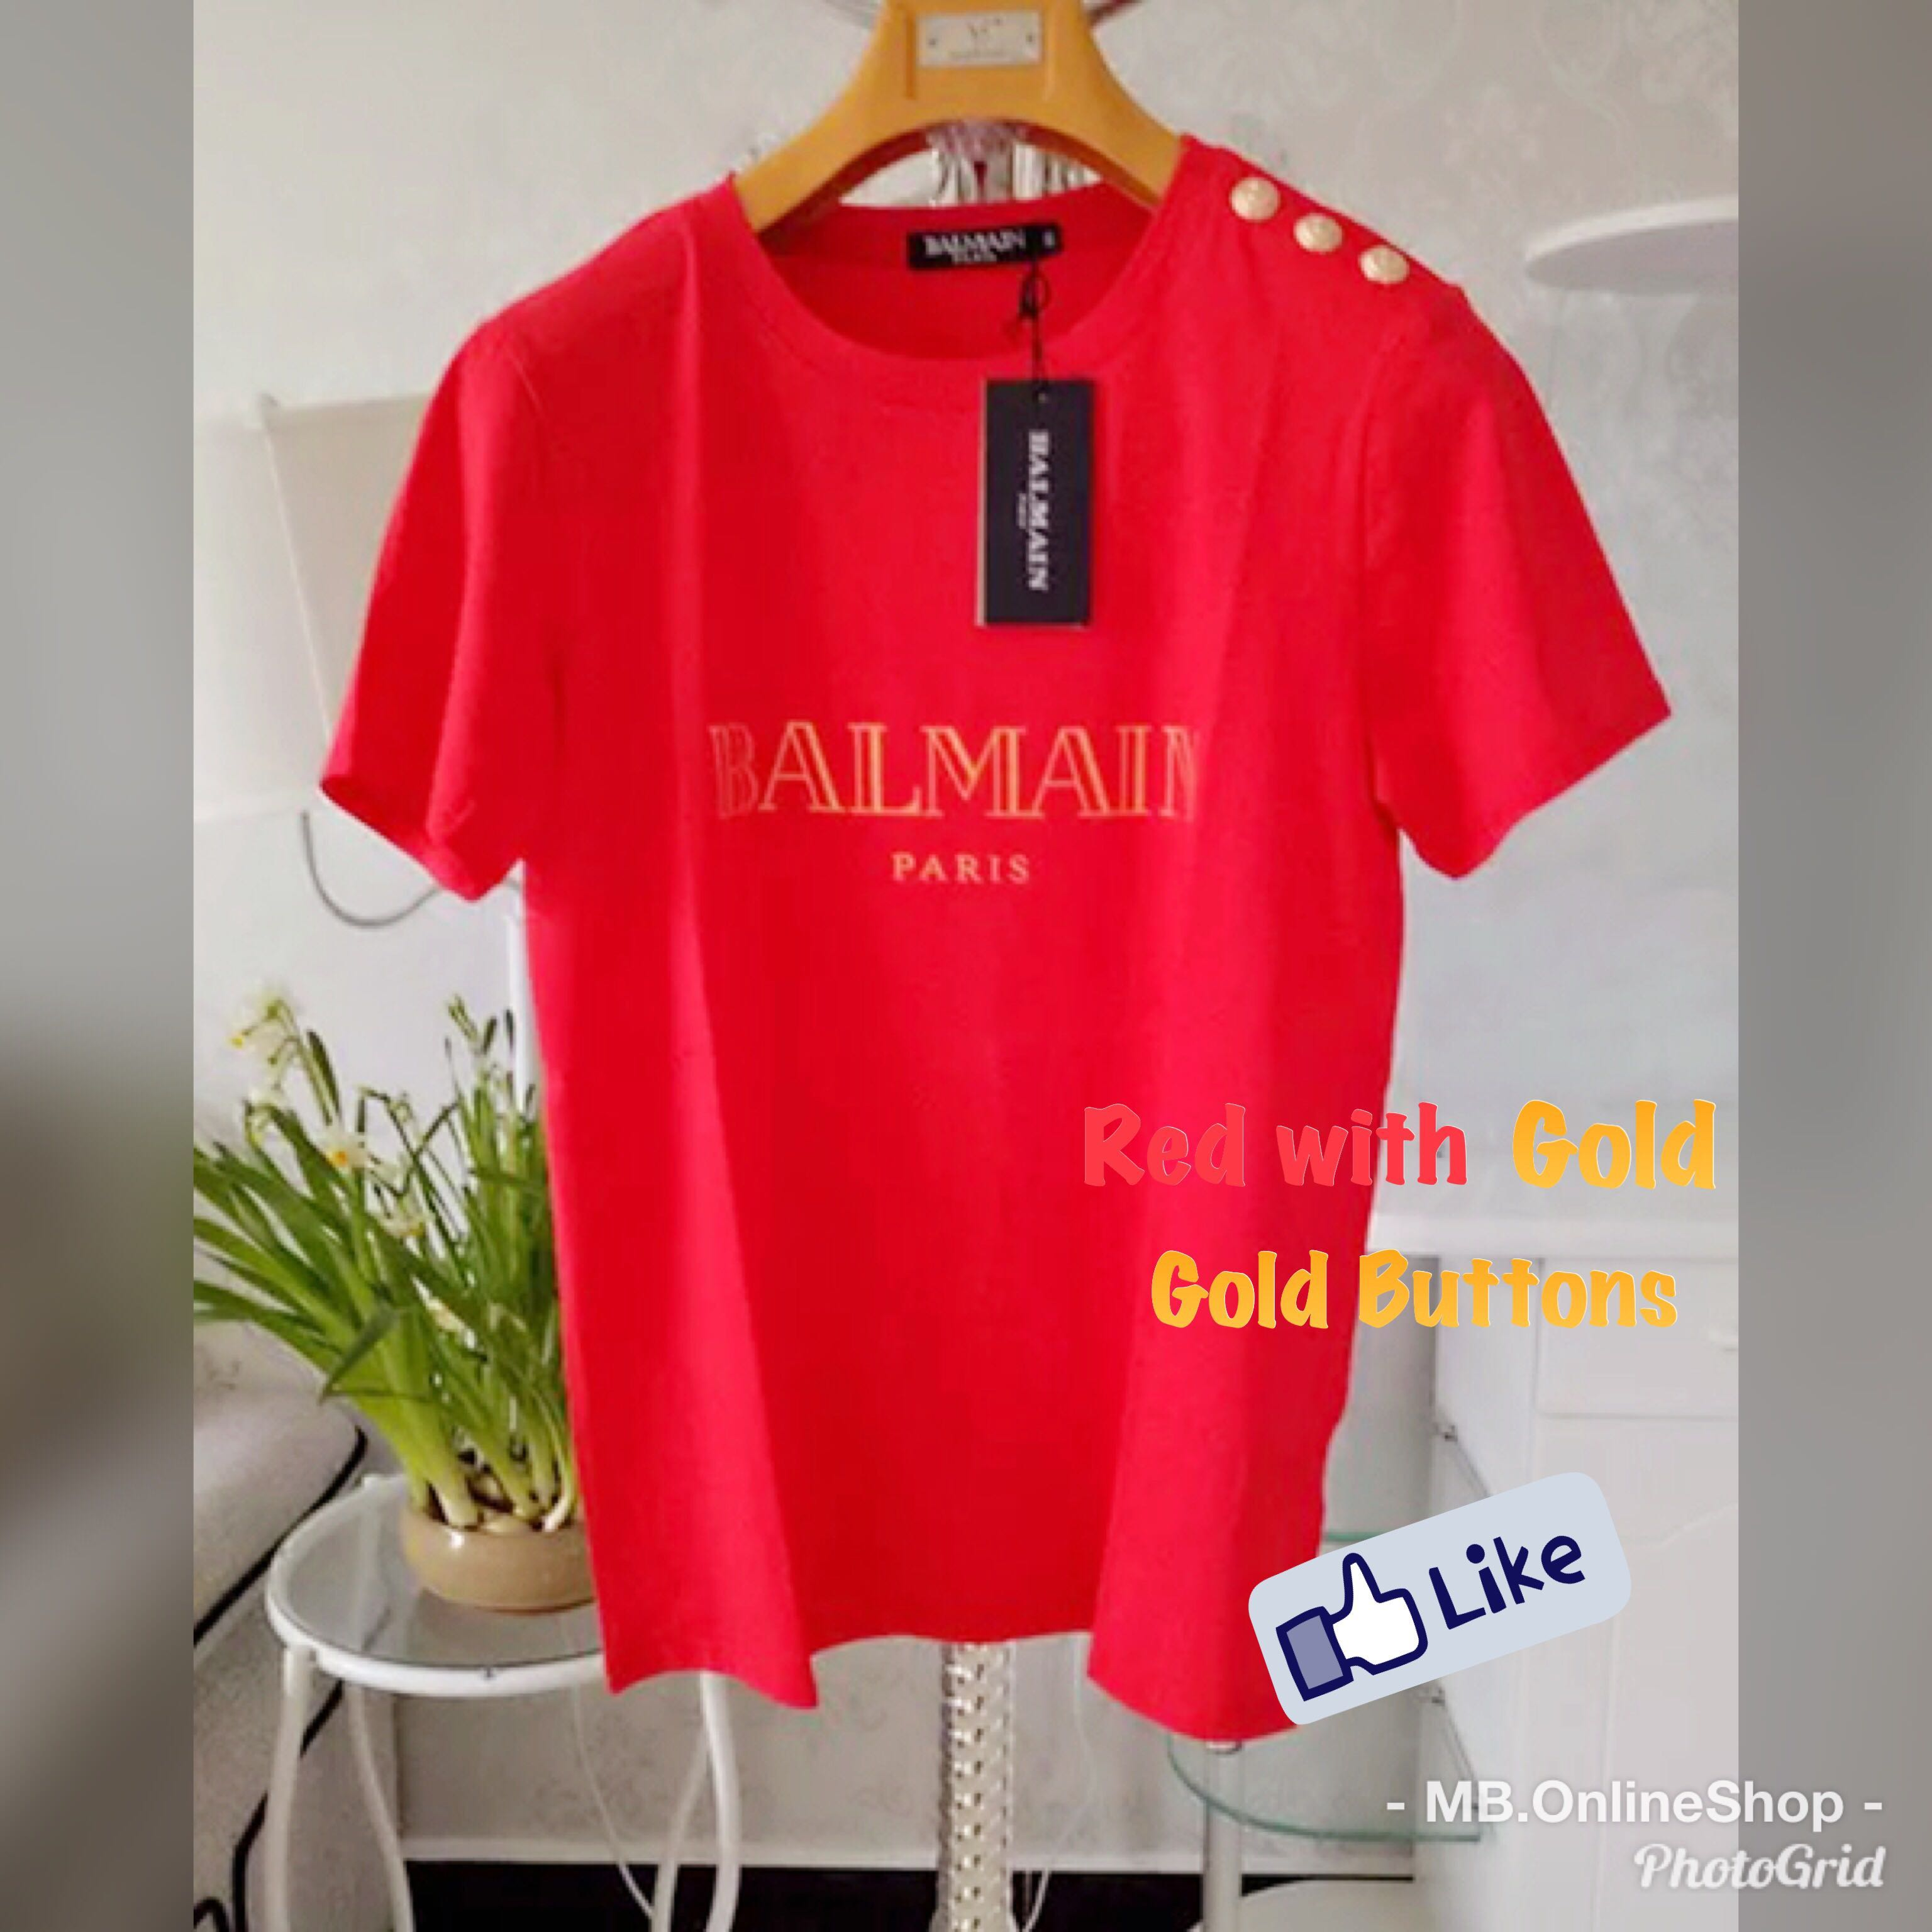 5e4ce9353 PO] Balmain Logo-Print Cotton T-Shirt , Women's Fashion, Clothes ...